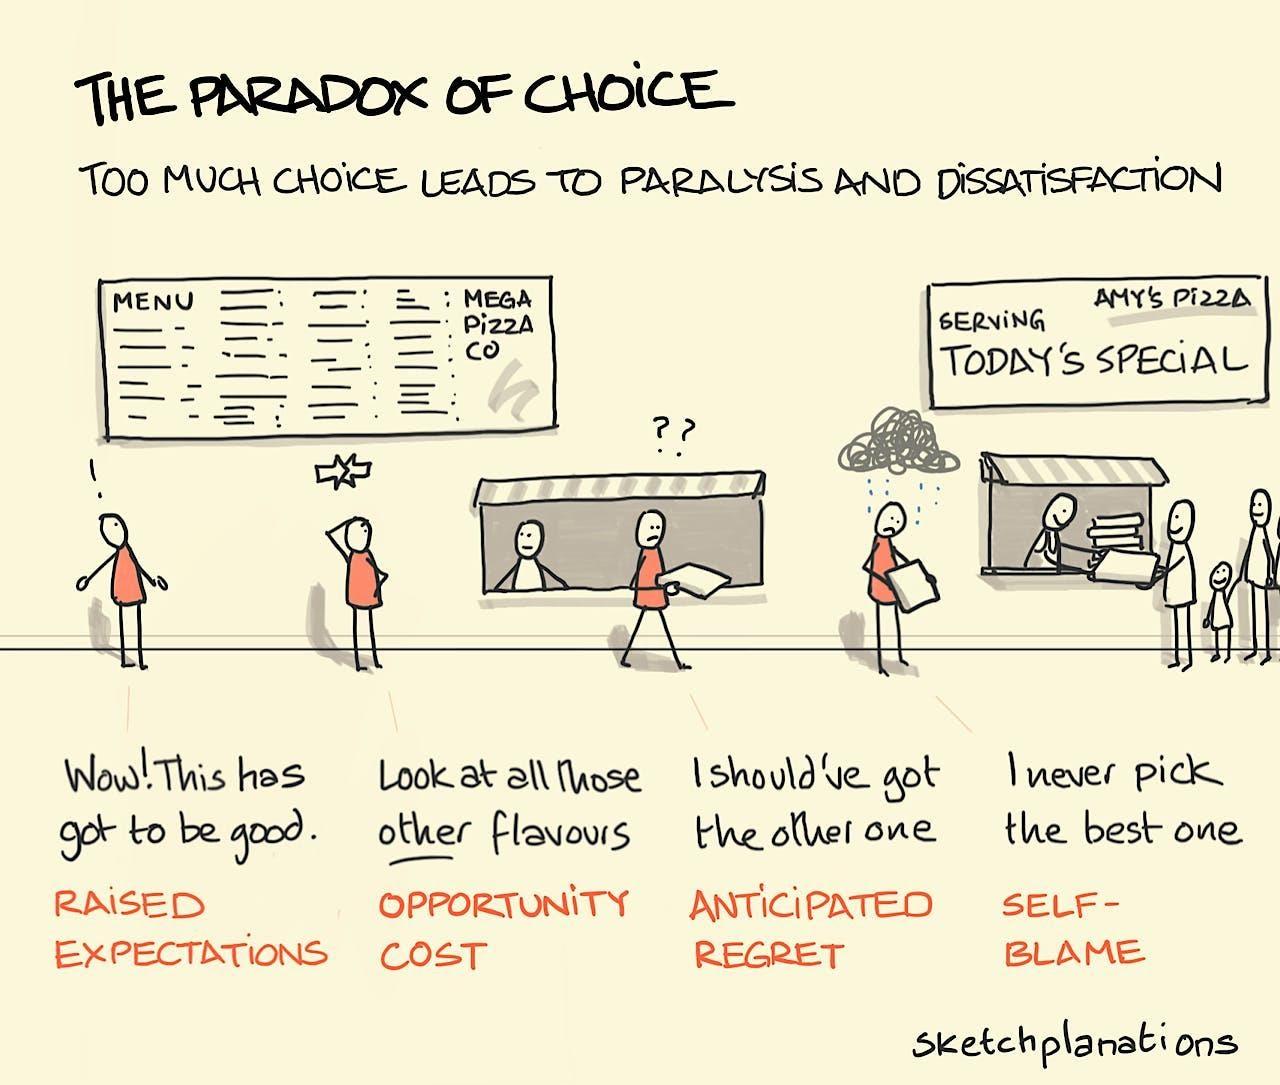 The paradox of choice - Sketchplanations